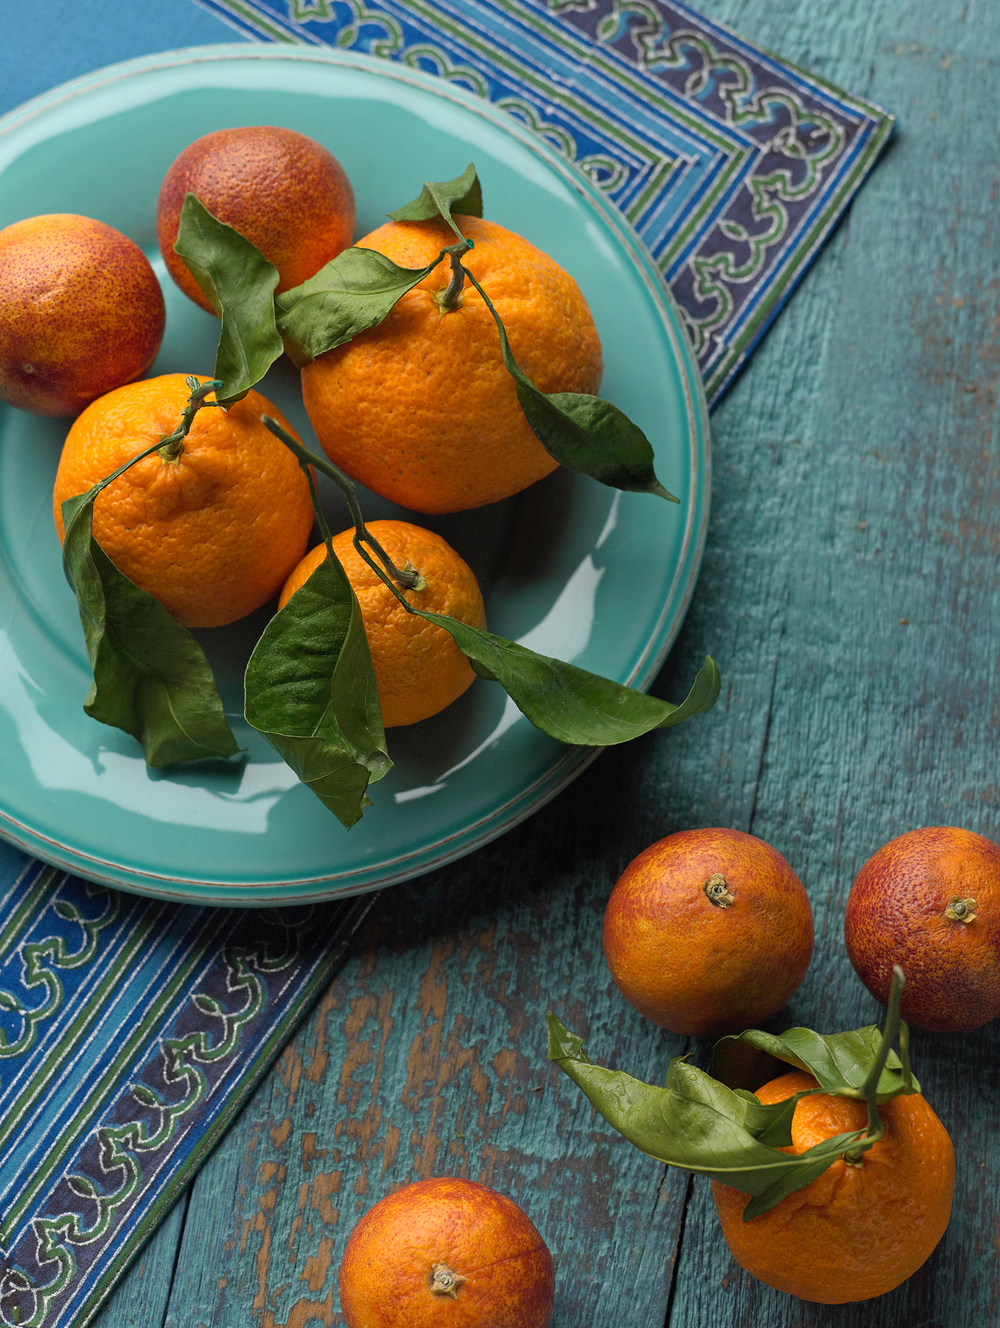 Orange, Geoff Fosbrook.jpg